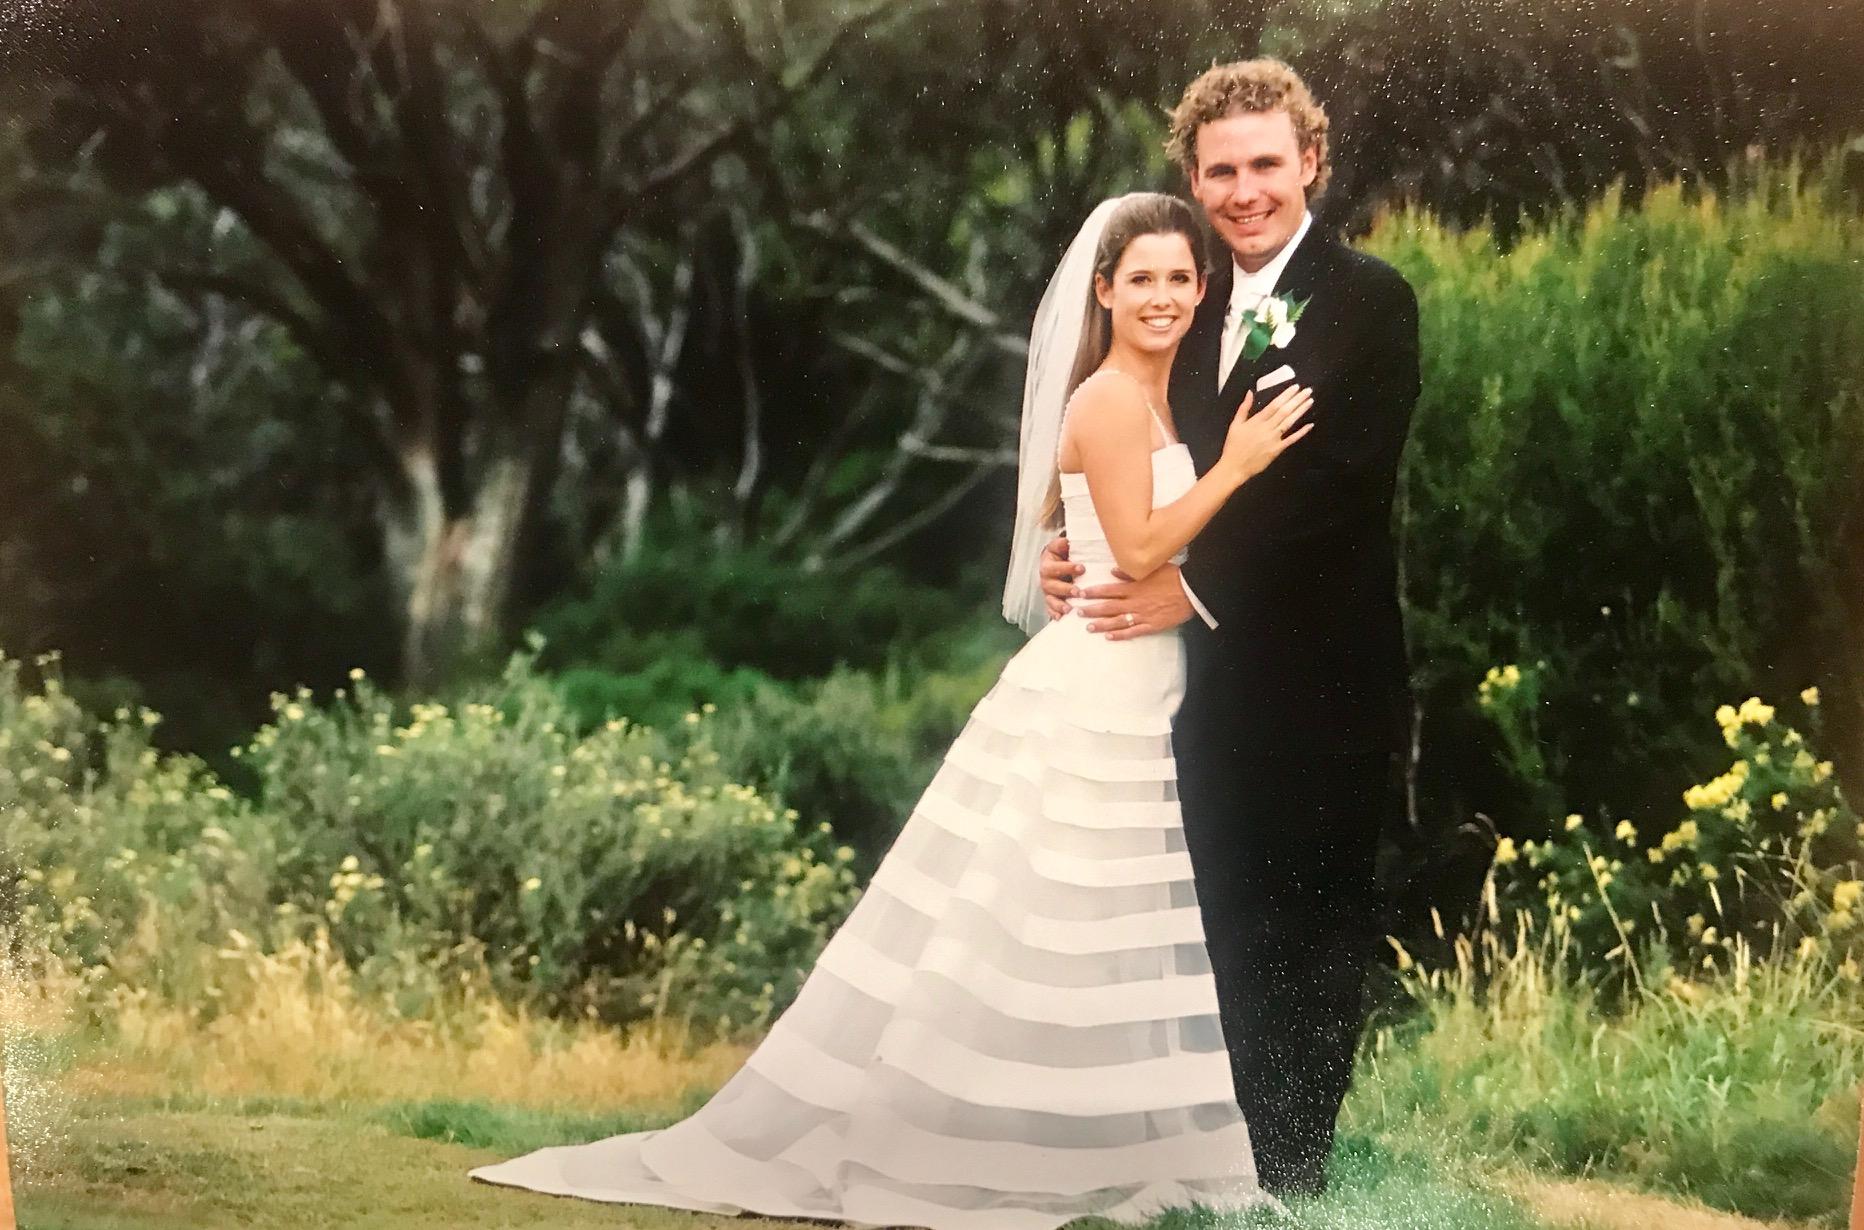 Amber Higlett and Chris Sherlock - Nine News Presenter Amber Sherlock married her husband Chris on March 8th, 2004 in Thredbo.